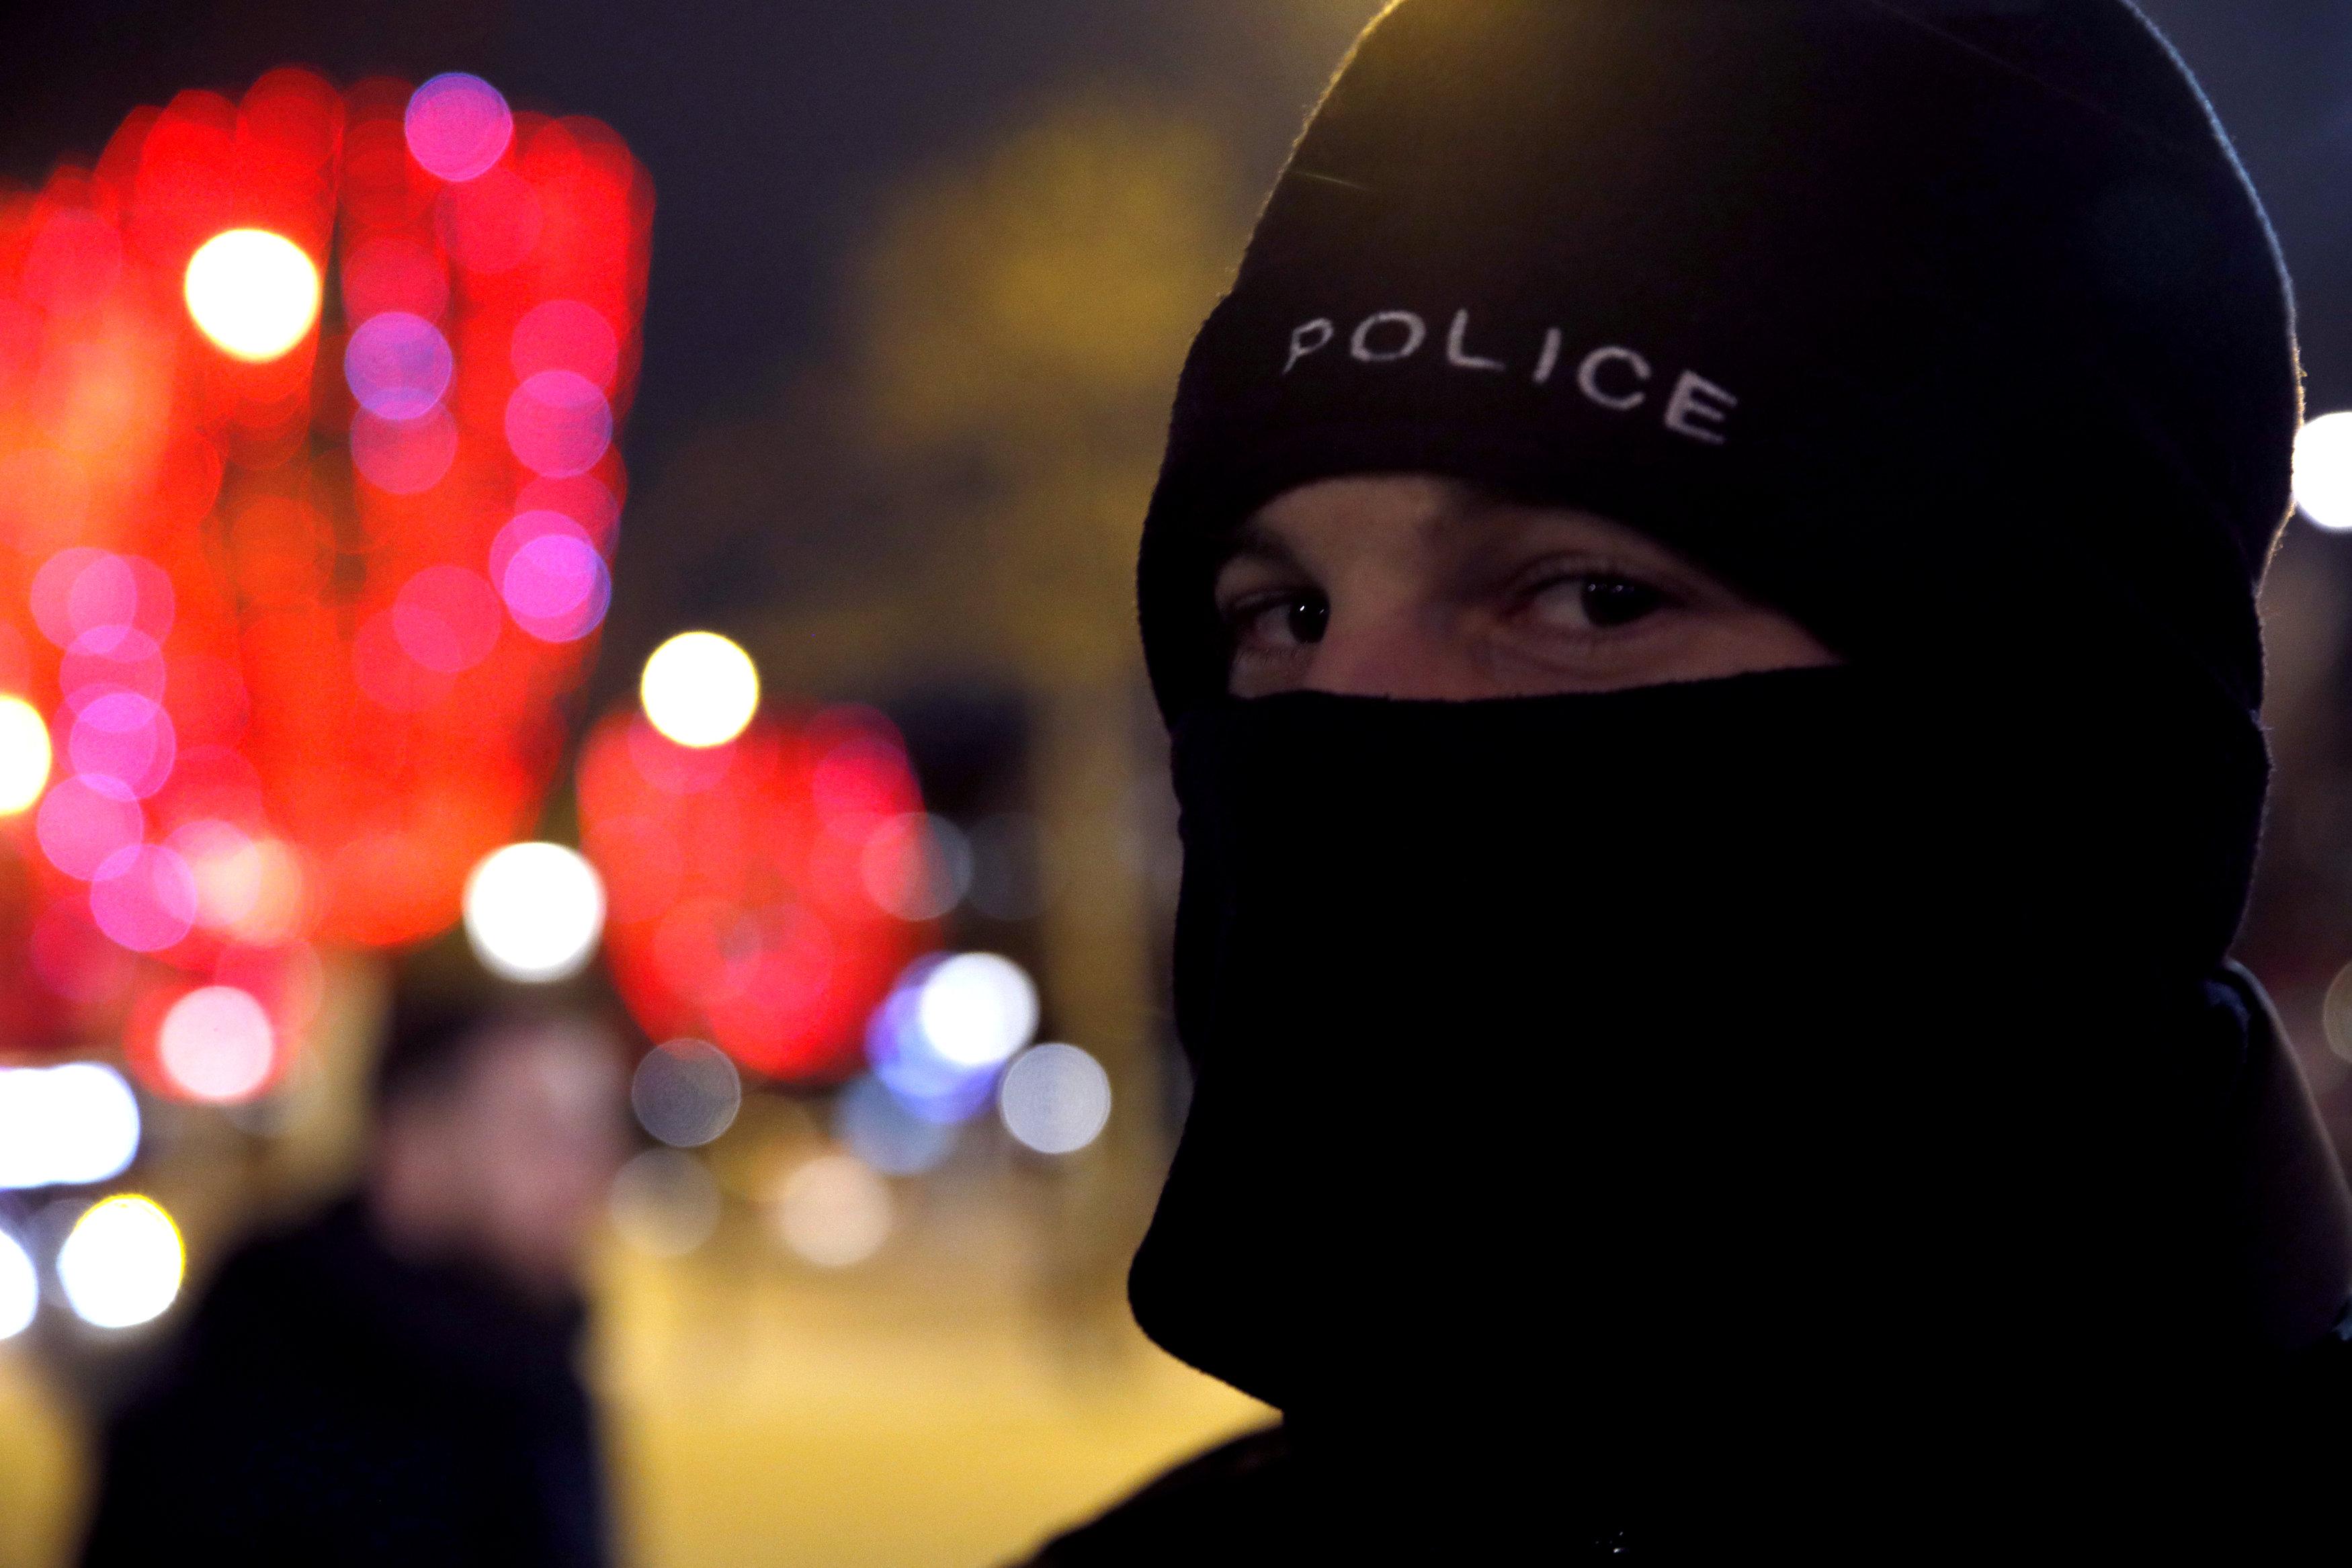 2018-12-20T222535Z_1429851632_RC1EAF997470_RTRMADP_3_FRANCE-PROTESTS-POLICE